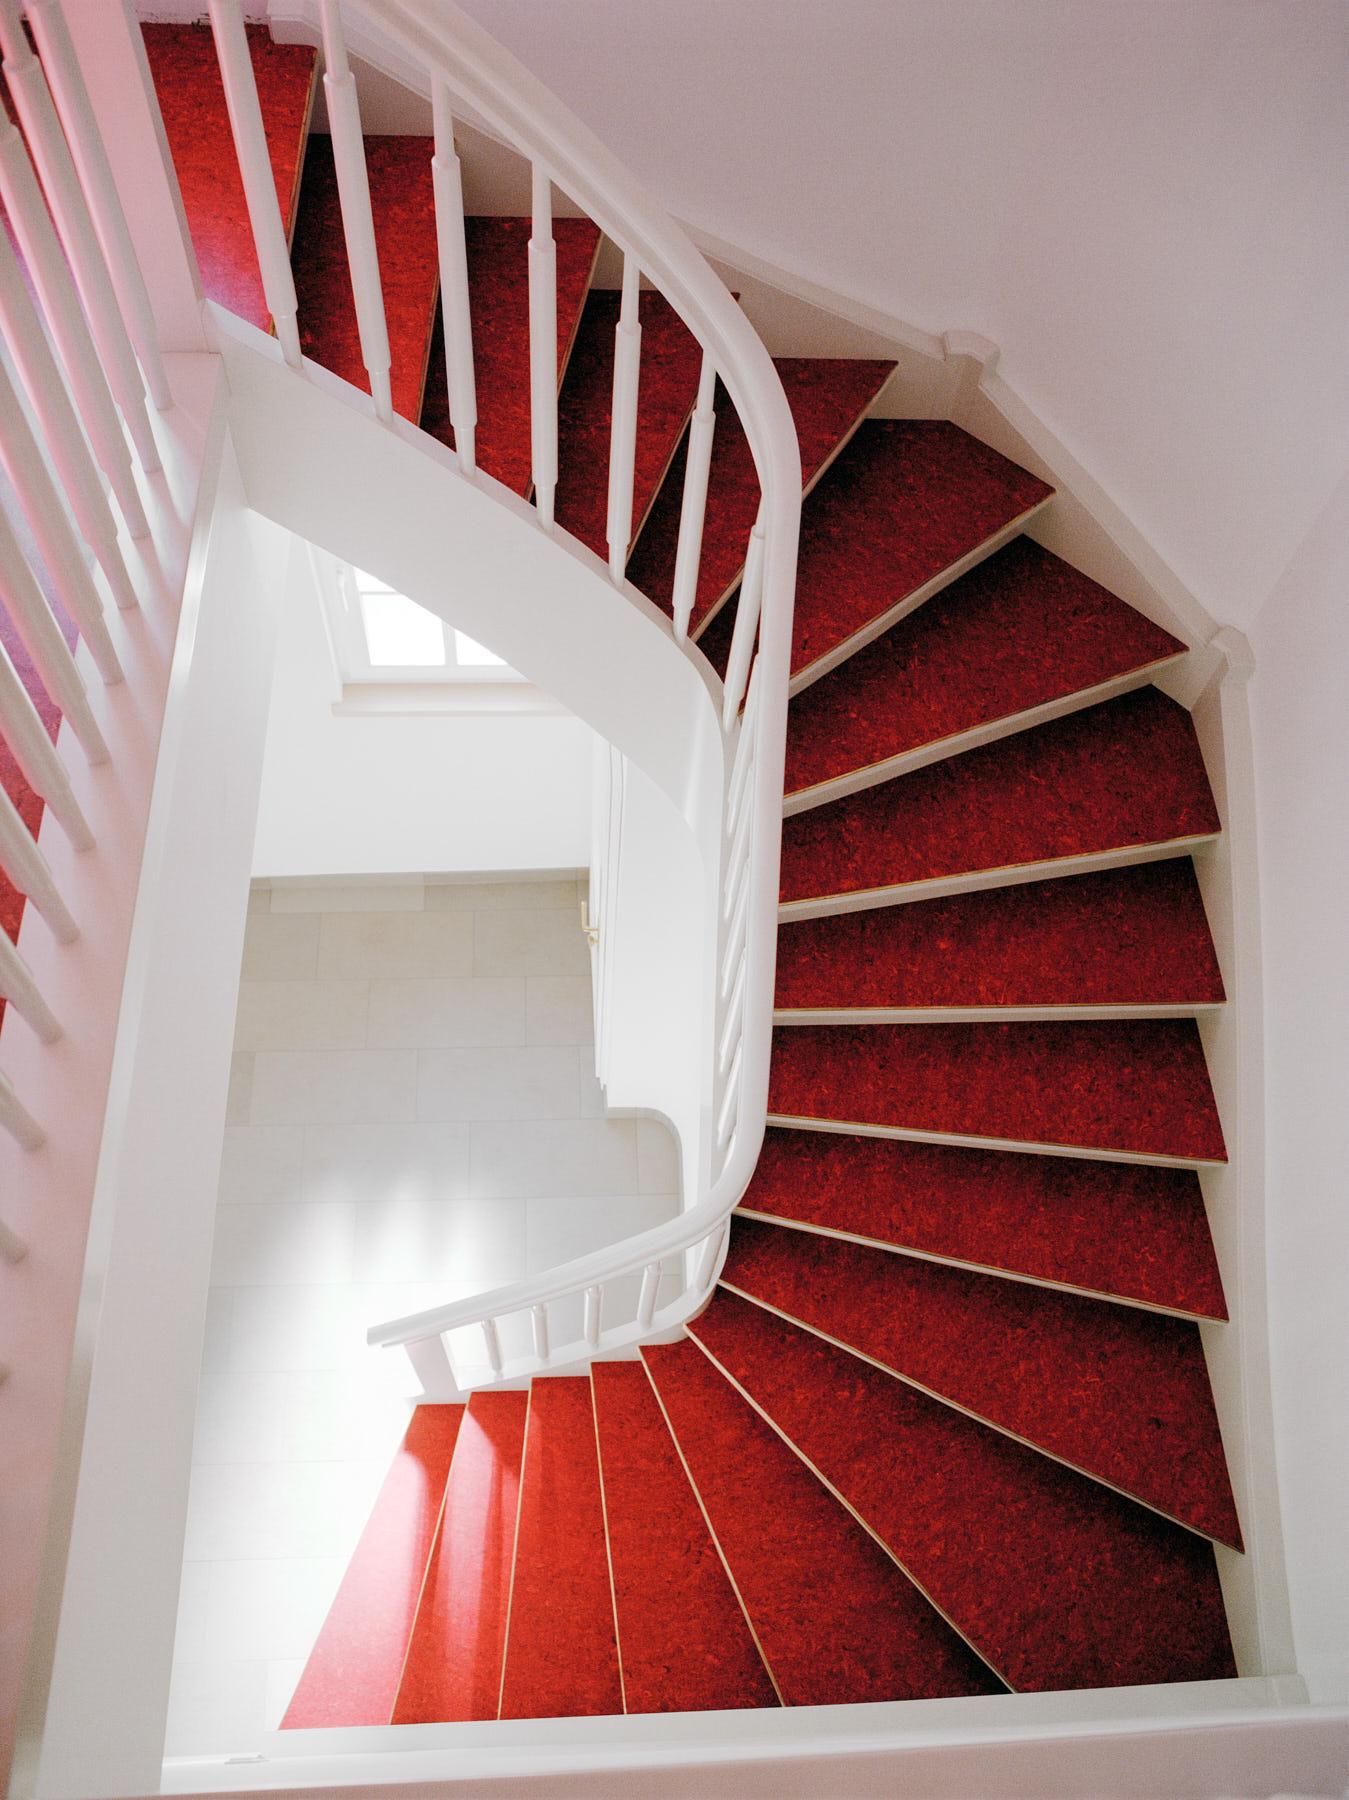 wei e treppe mit rotem linoleum daniel beutler treppenbau. Black Bedroom Furniture Sets. Home Design Ideas